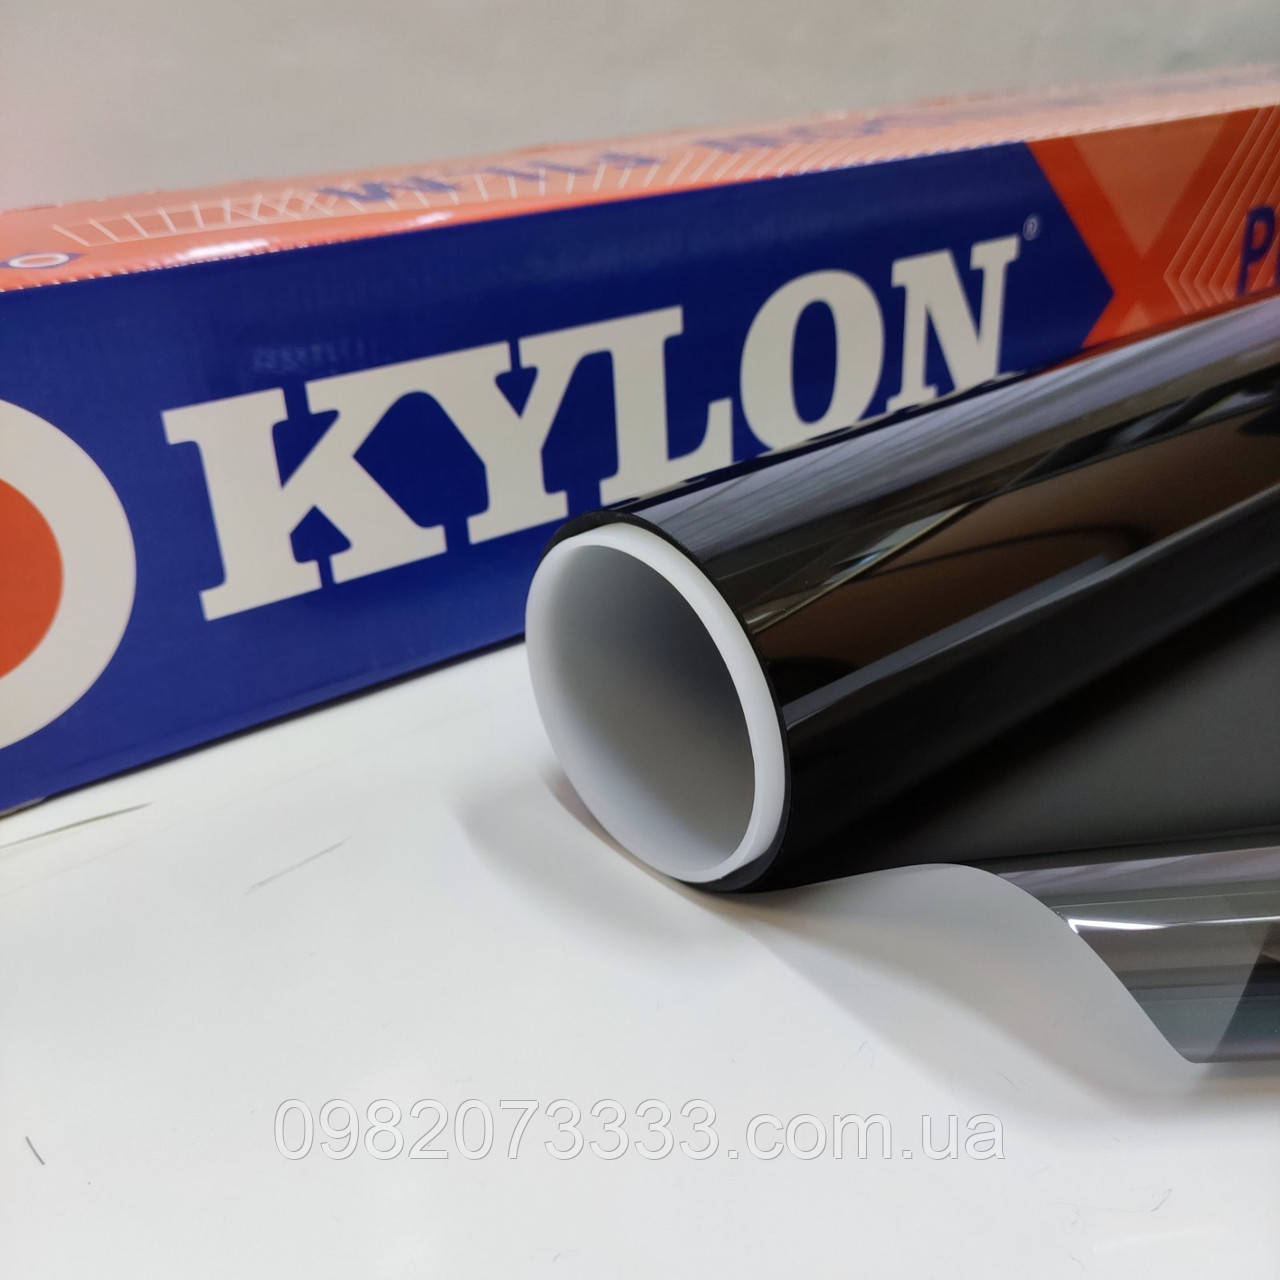 Металлизированная HP Standart 35 Kylon автомобильная тонировочная плёнка ширина рулон 1,524 (цена за кв.м.)